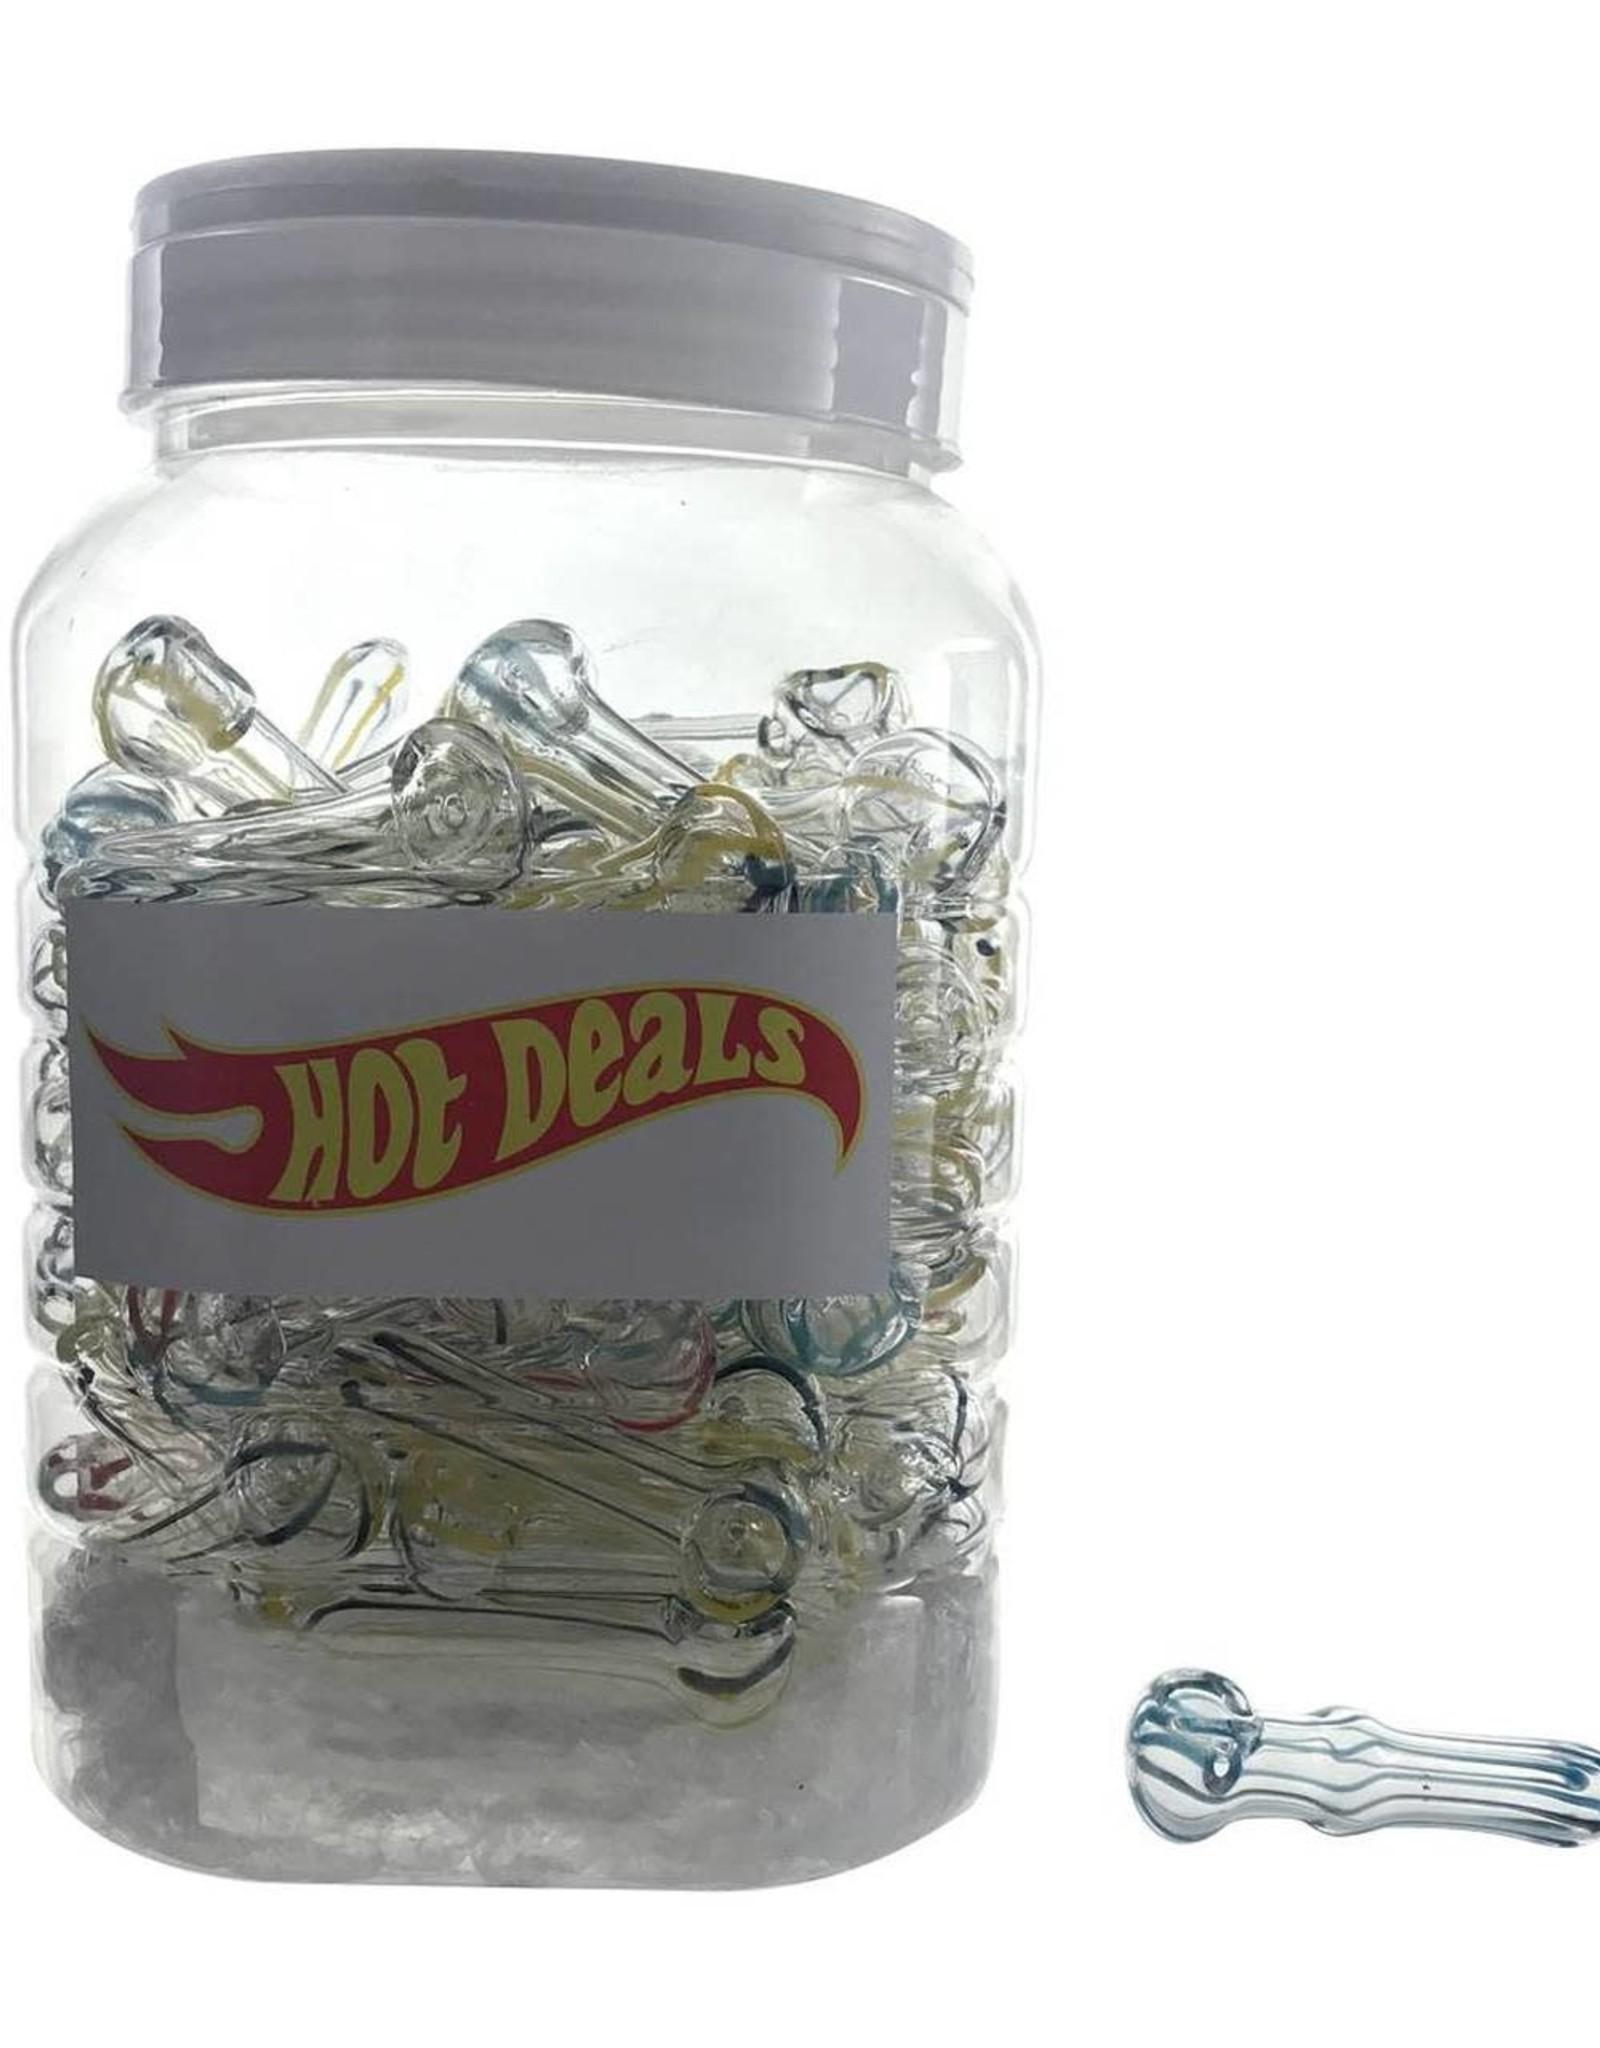 "Hot Deals - 2.5"" Inside Out Spoon w/ Stripes"